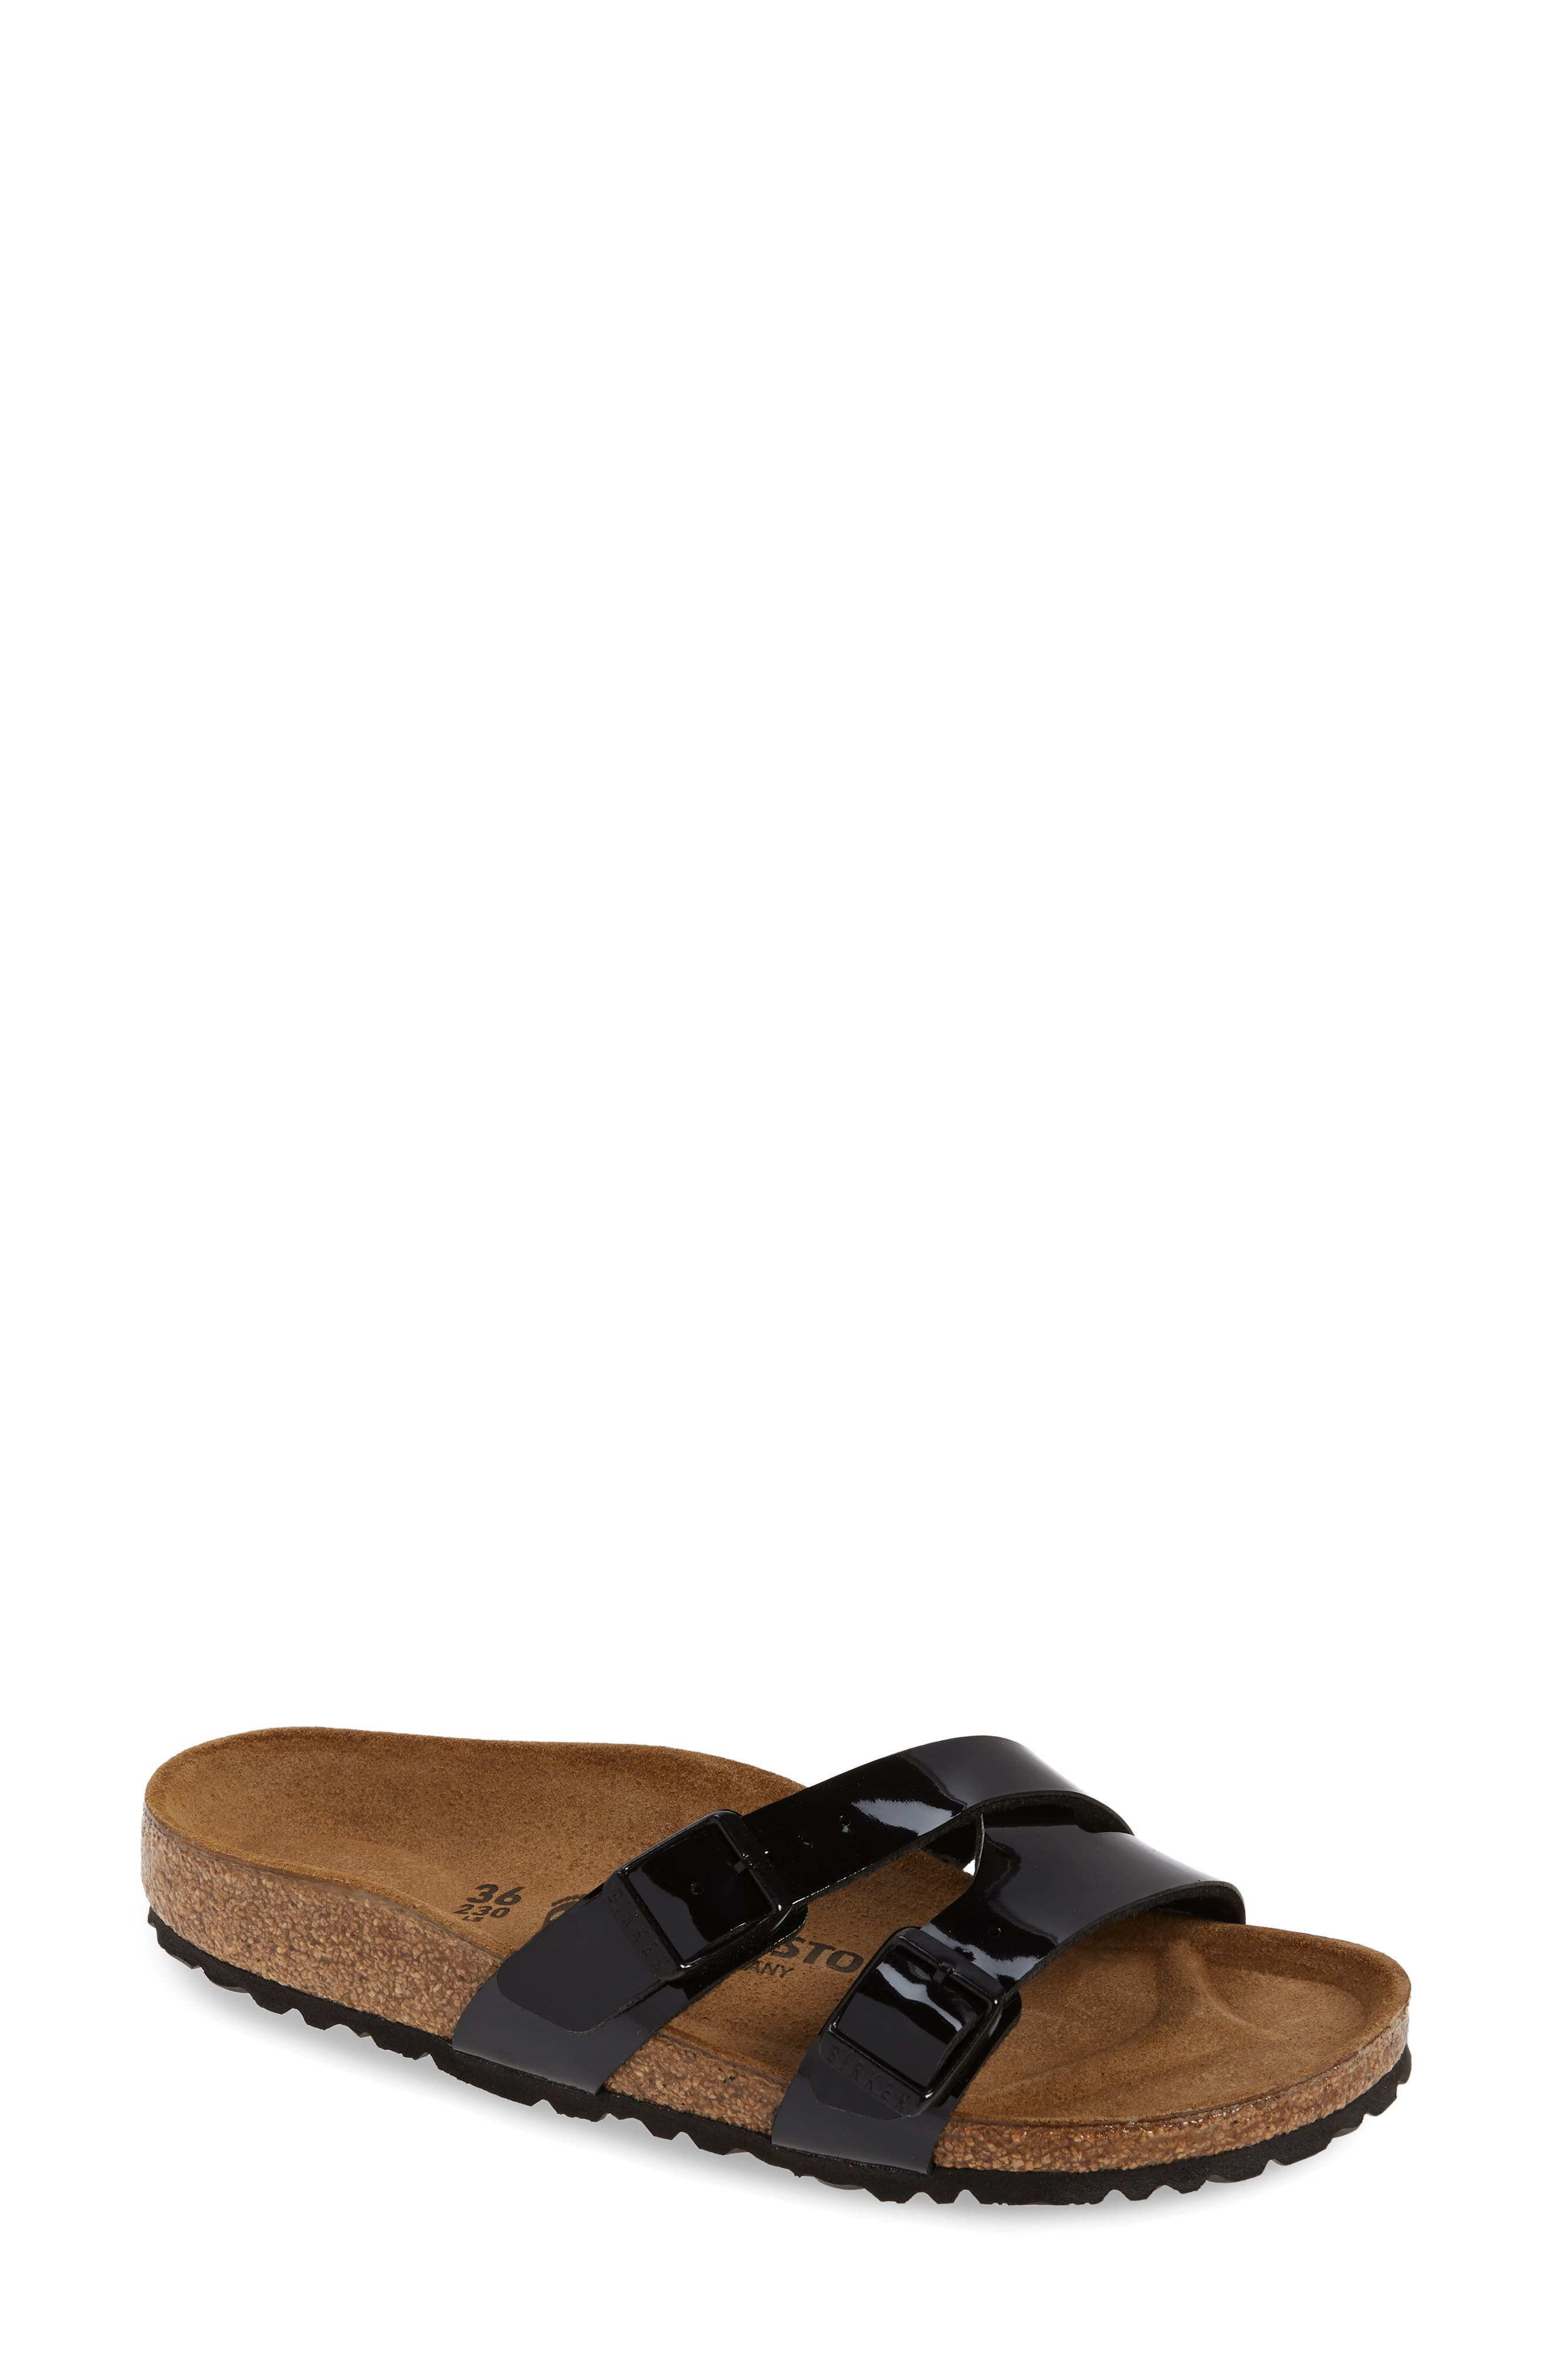 Birkenstock Yao Patent Slide Sandal, Black